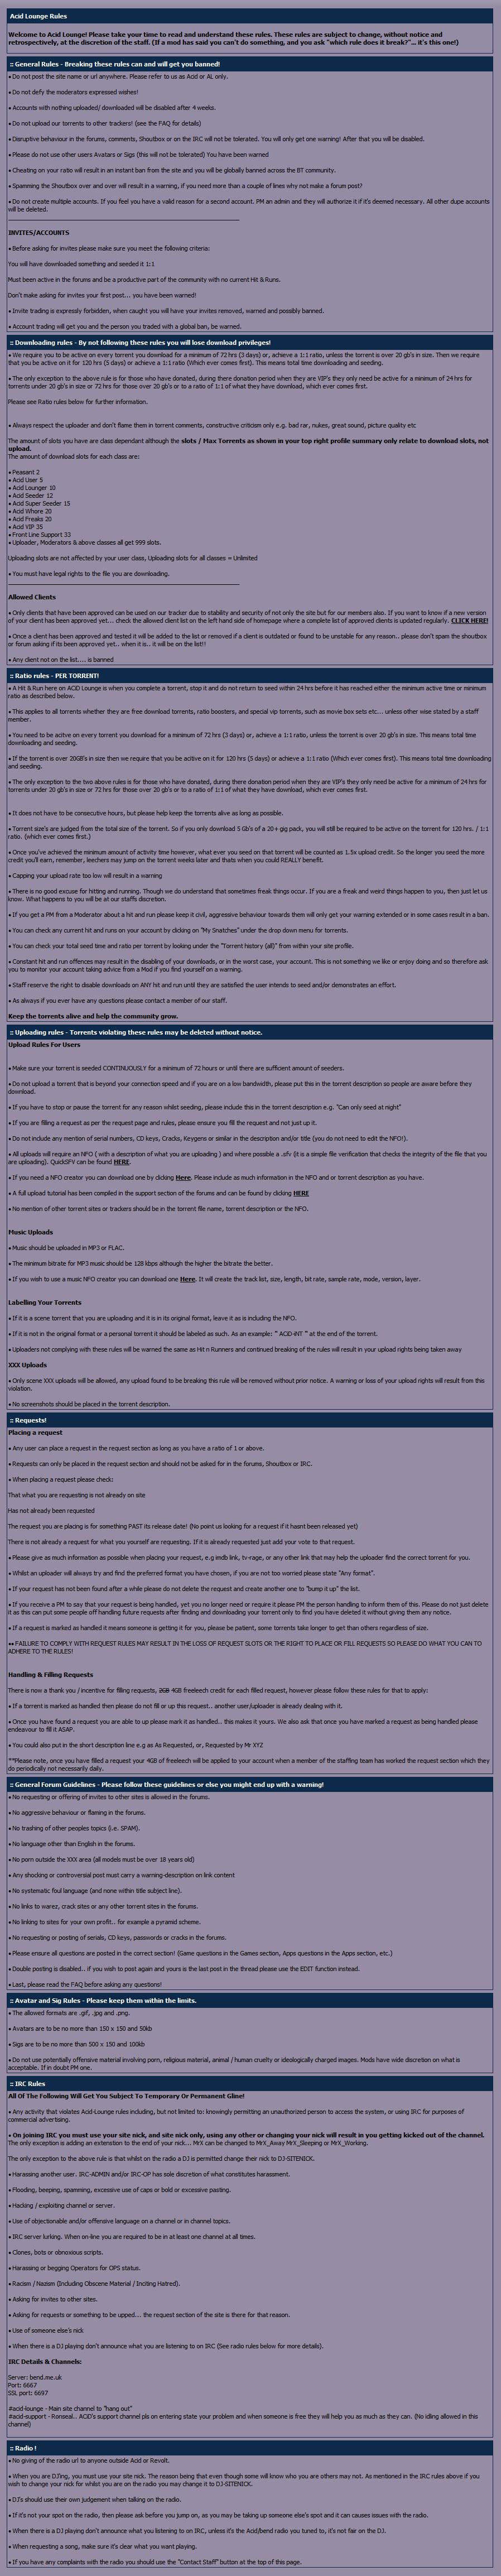 Acid-lounge org uk | ACID | General, 0-day | 2013 Review